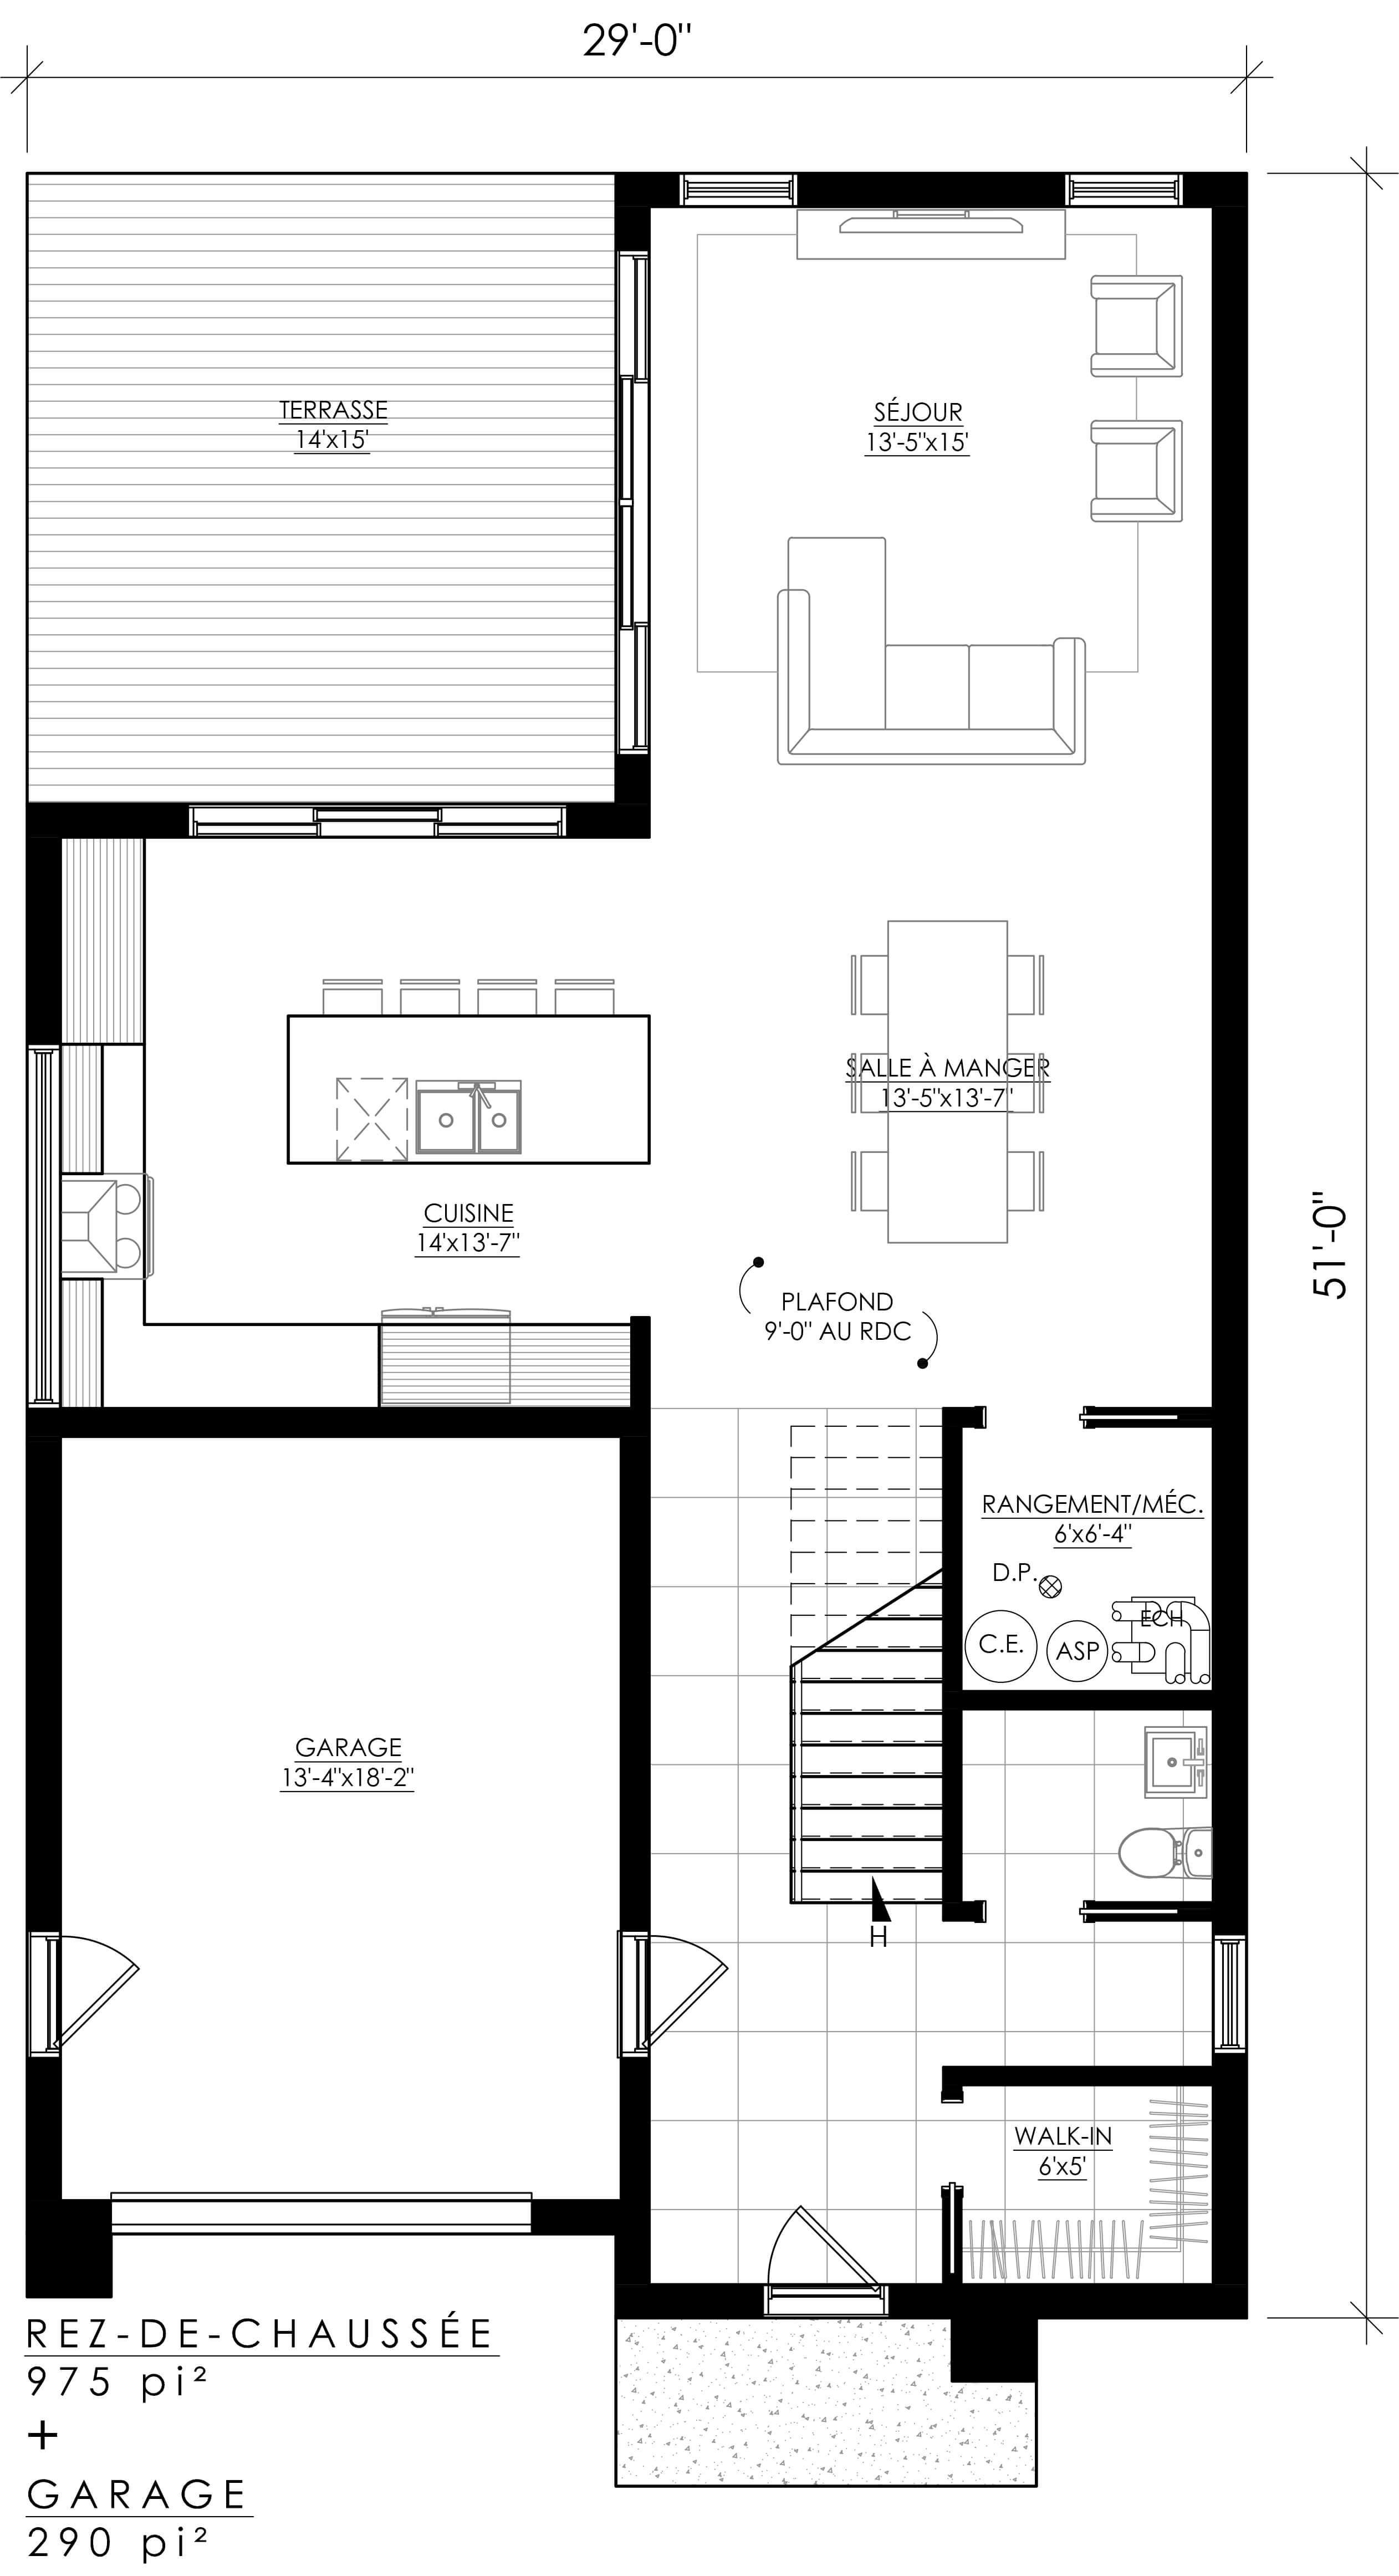 Plan De Maison Moderne plan de maison moderne Ë_101 in 2019 | modern house design